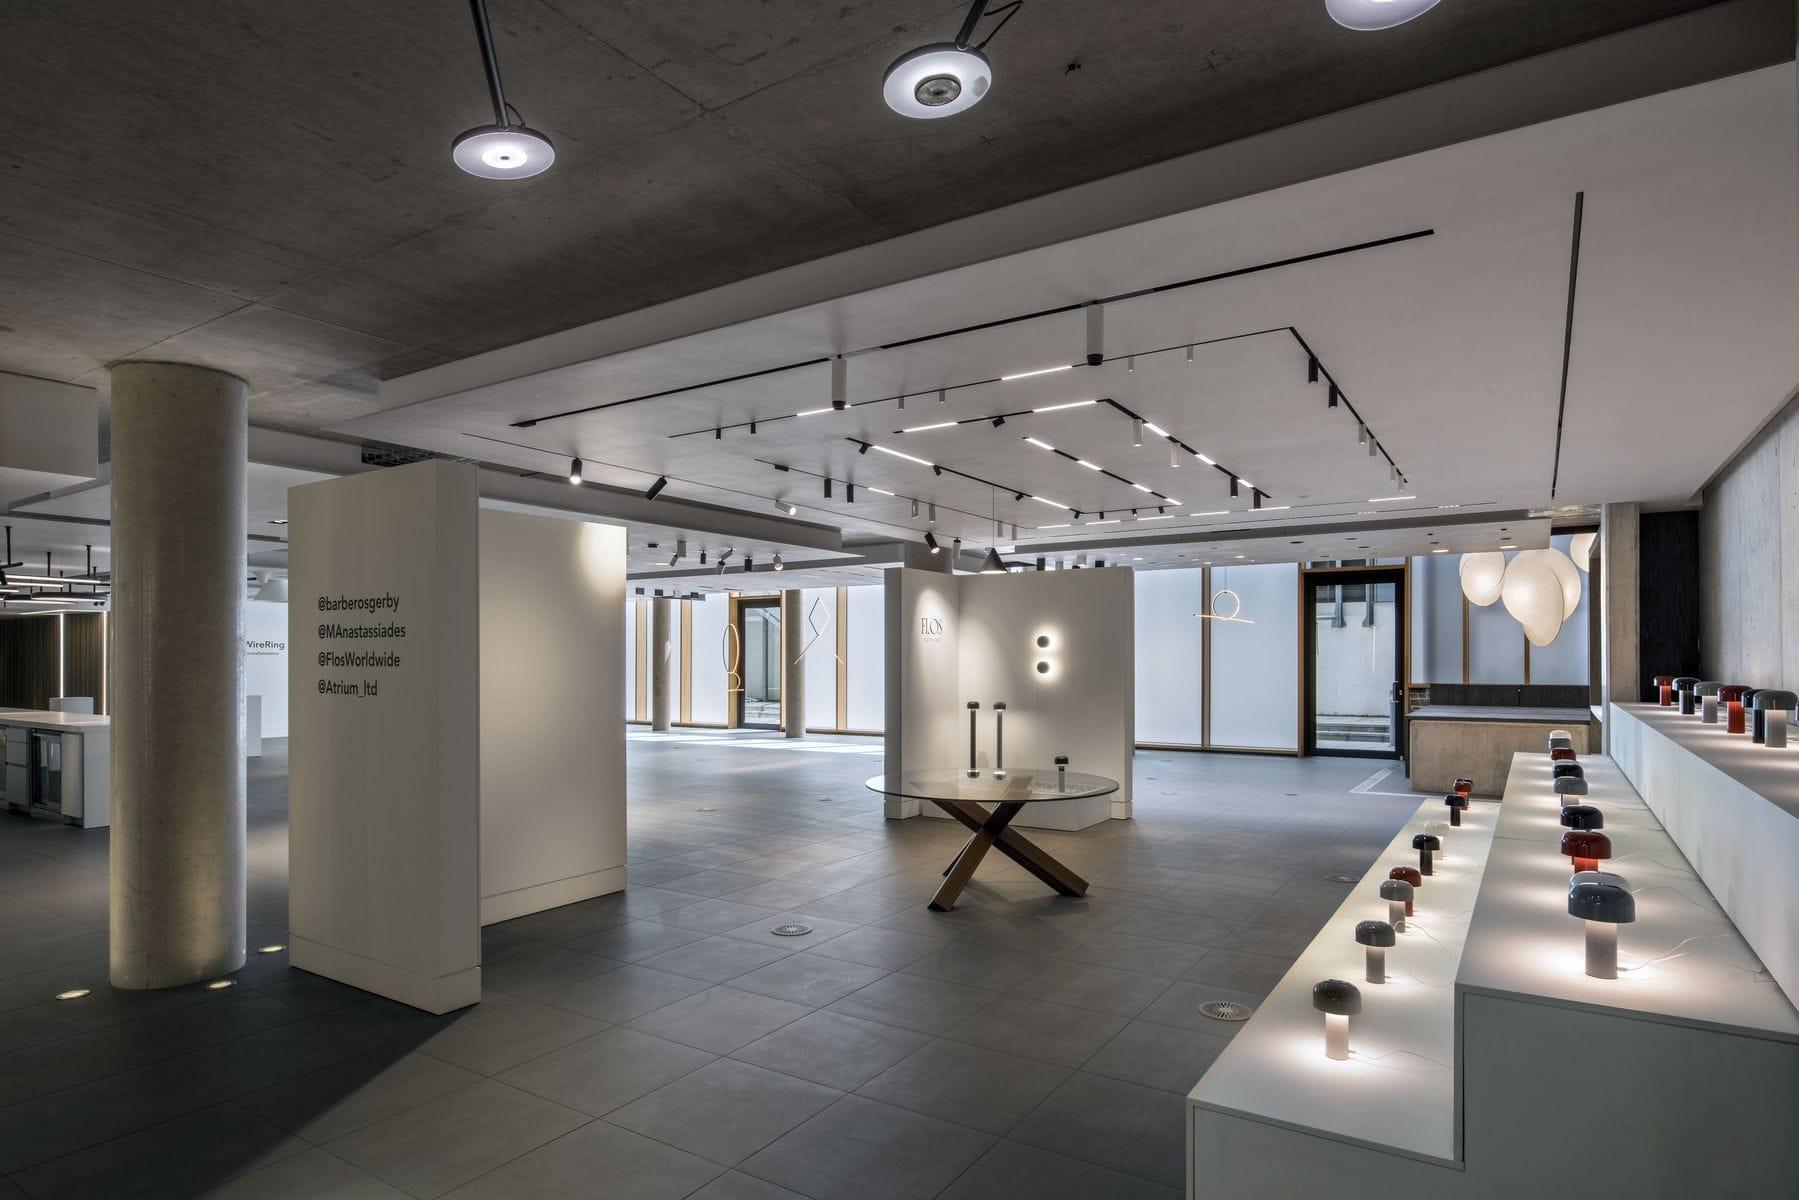 Flos Introduces New Lighting Designs At Atrium In London